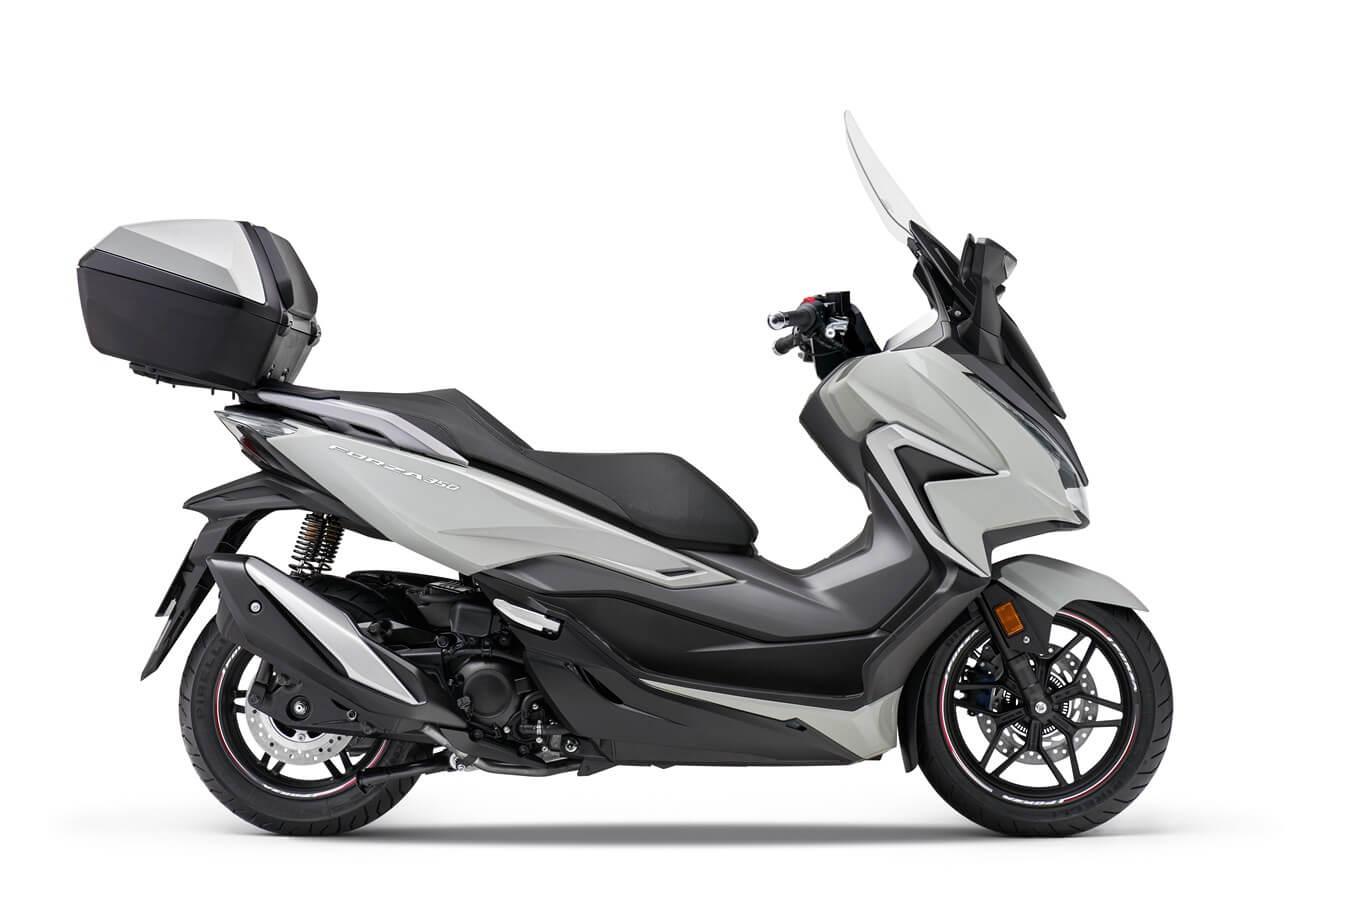 2021 Honda Forza 350 Scooter Storage / Trunk | Accessories